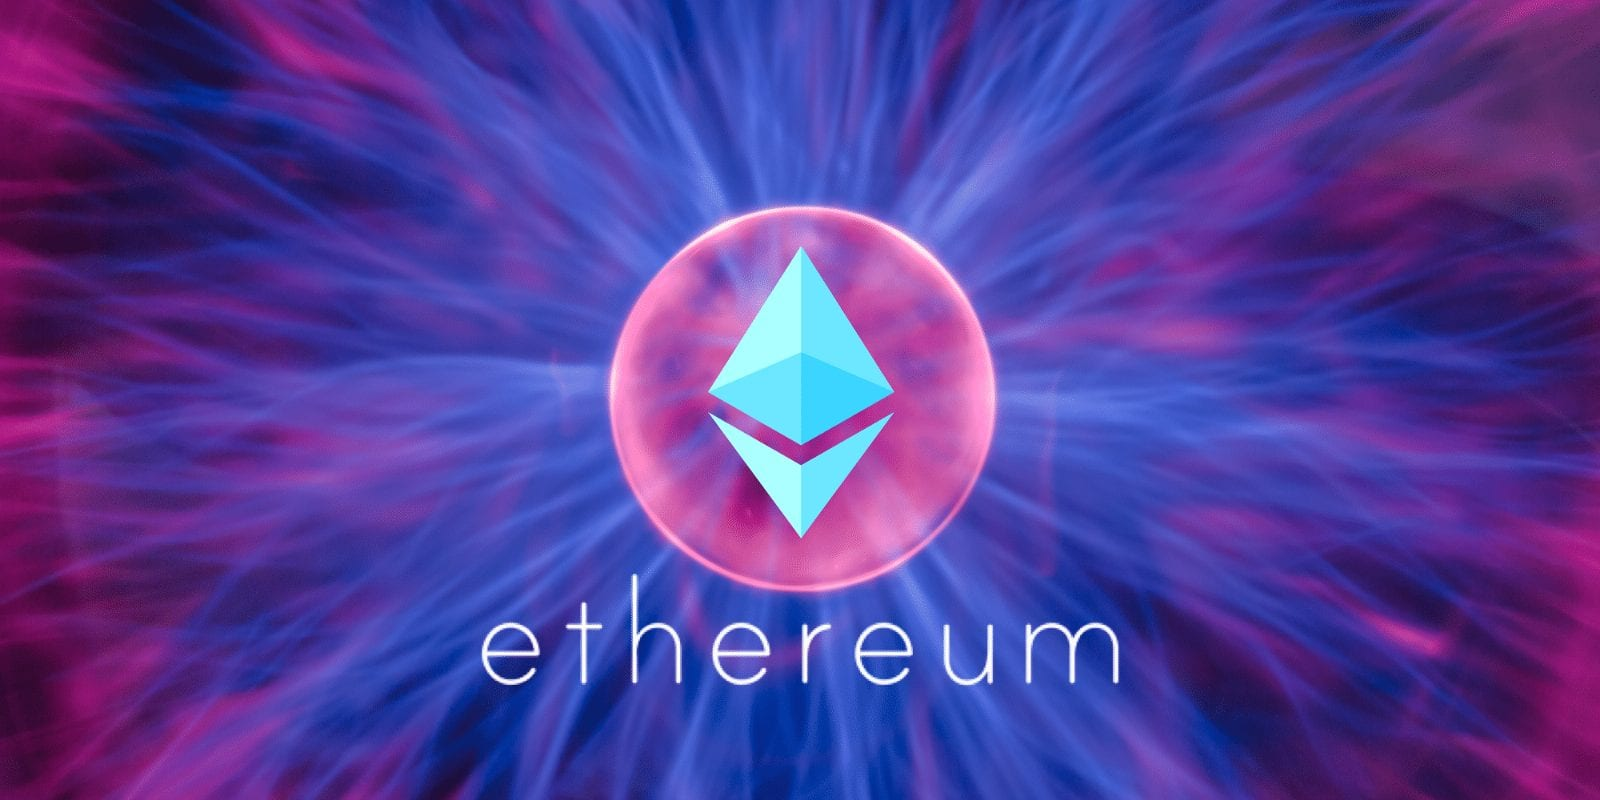 1 TgKD2N ZldnnOfaNztZiWQ - Ethereum-Based Efforts Aim To Make Crypto Transfers Simpler